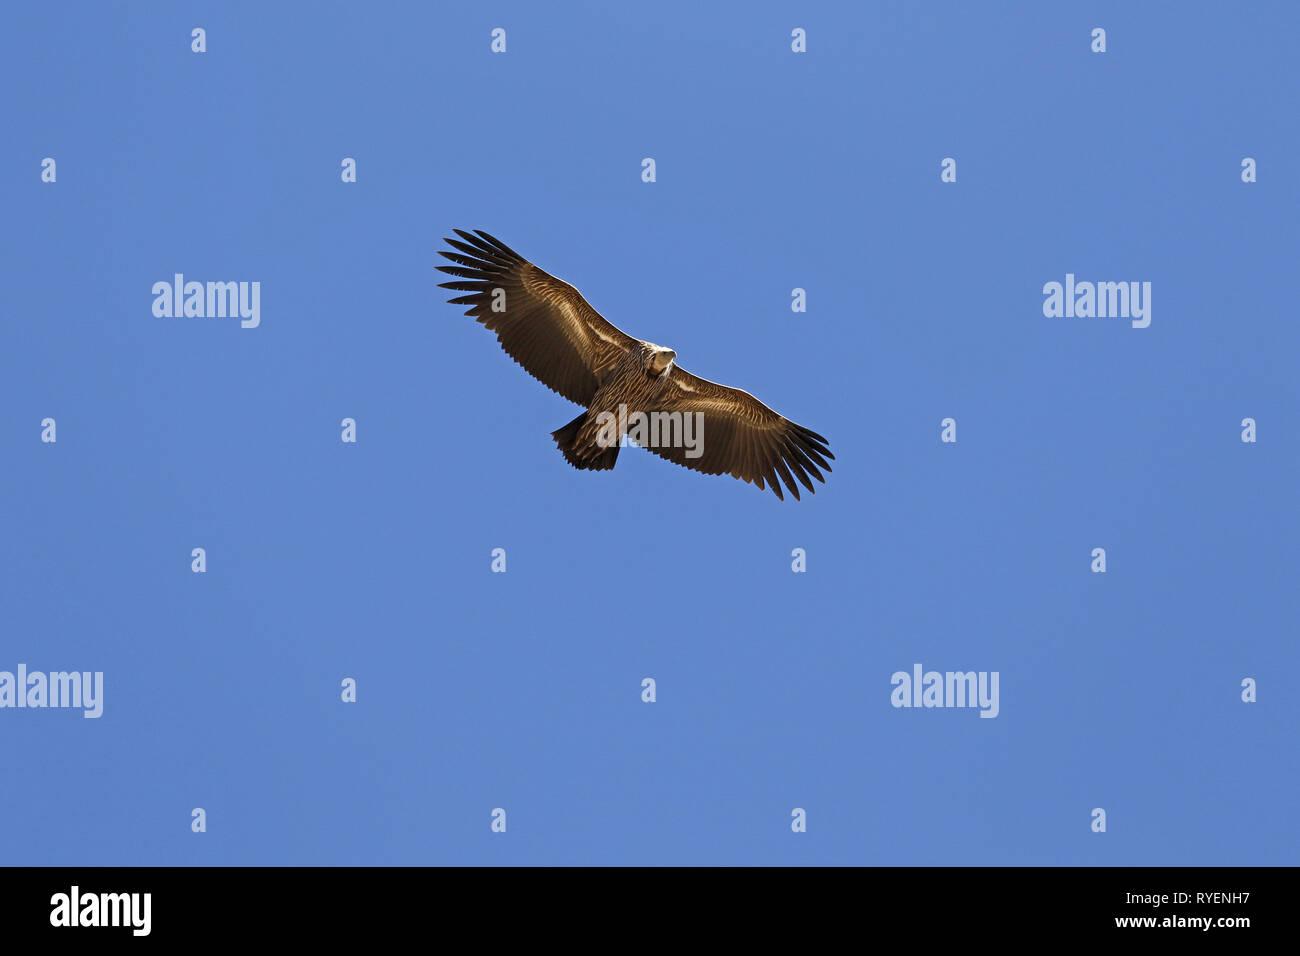 Himalayan Griffon Vulture soaring - Stock Image